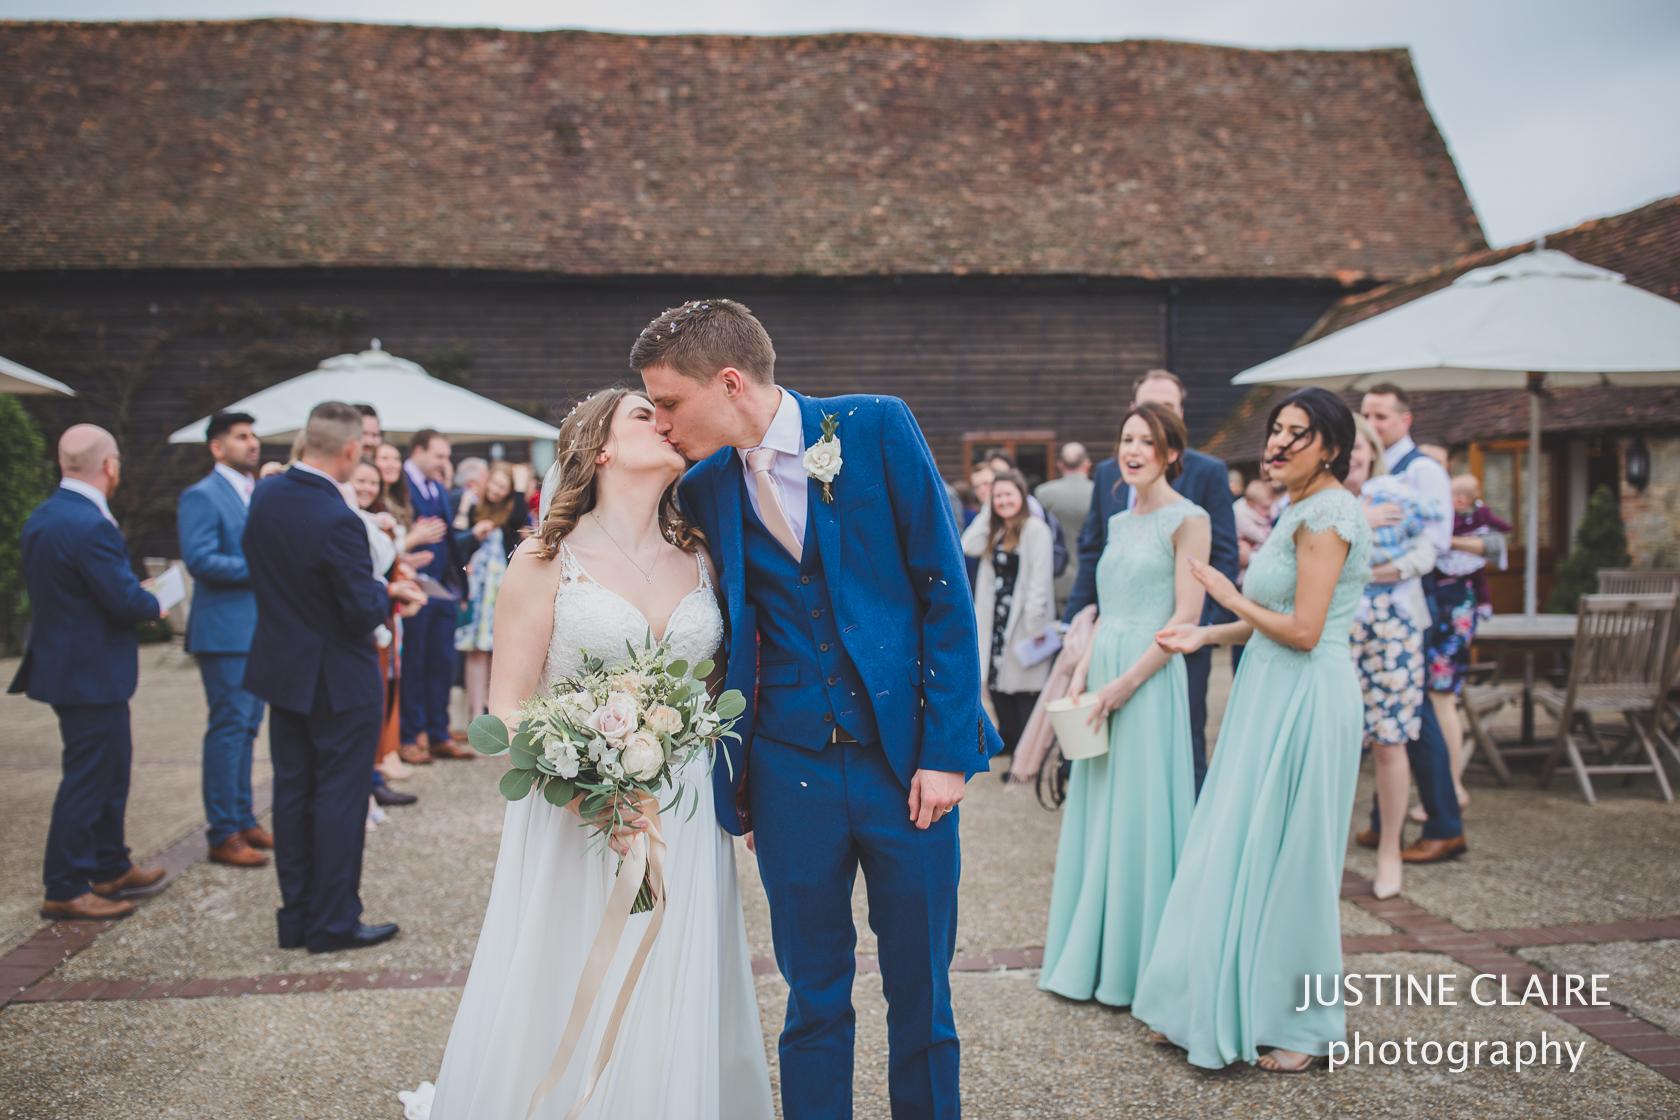 Fitzleroi Fittleworth petworth Billingshurst farm Wedding Photography by Justine Claire photographer Arundel Worthing Brighton-24.jpg